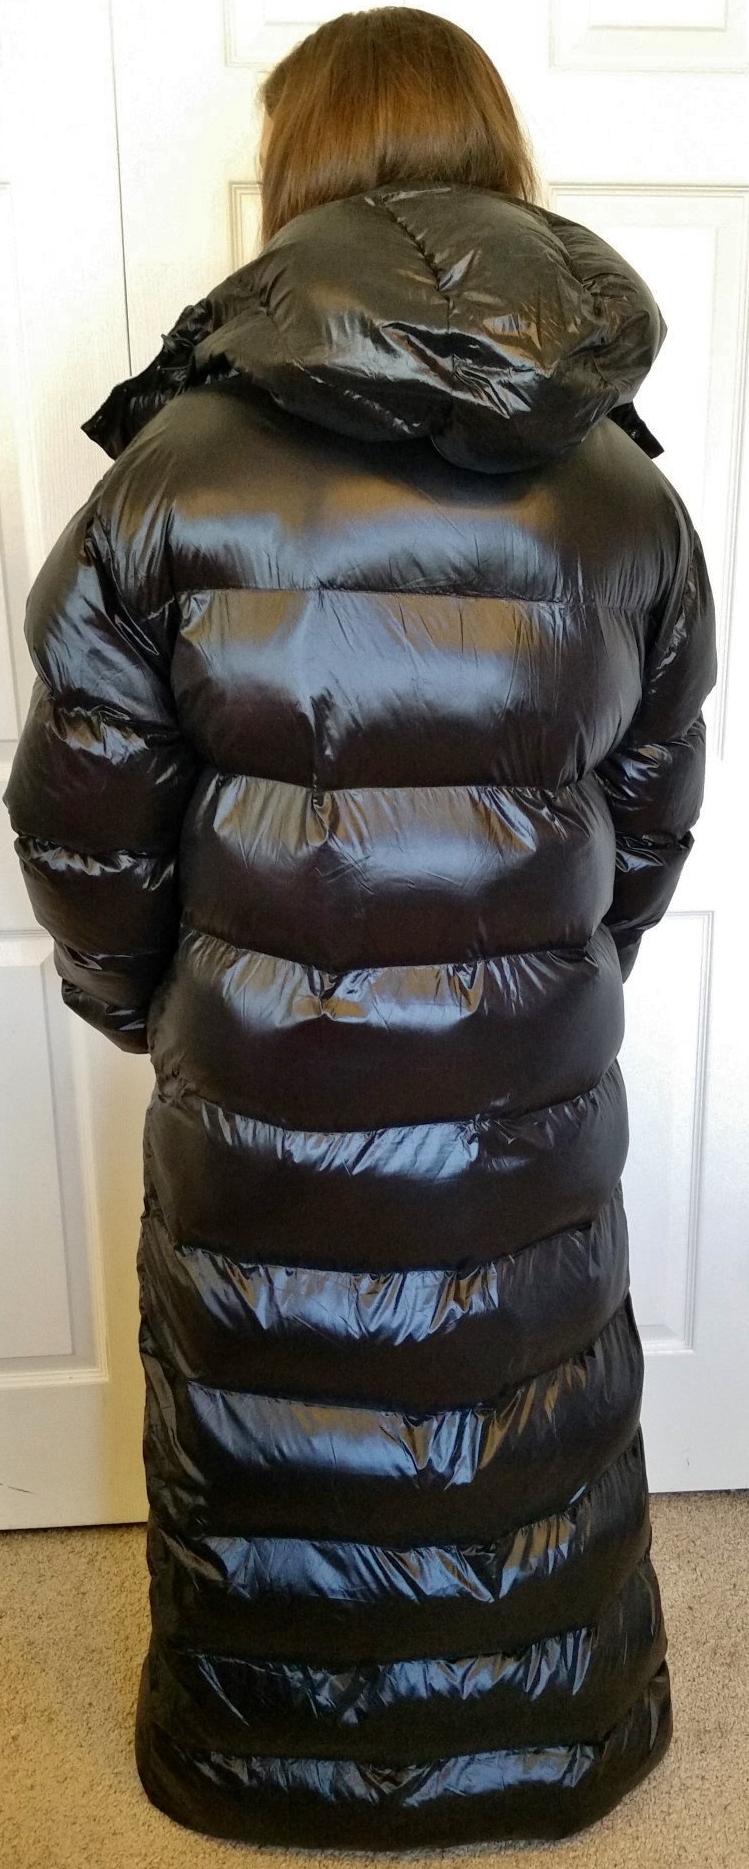 Bnwt Tianyoutextile Black Camo Long Coat Hoody 3xl